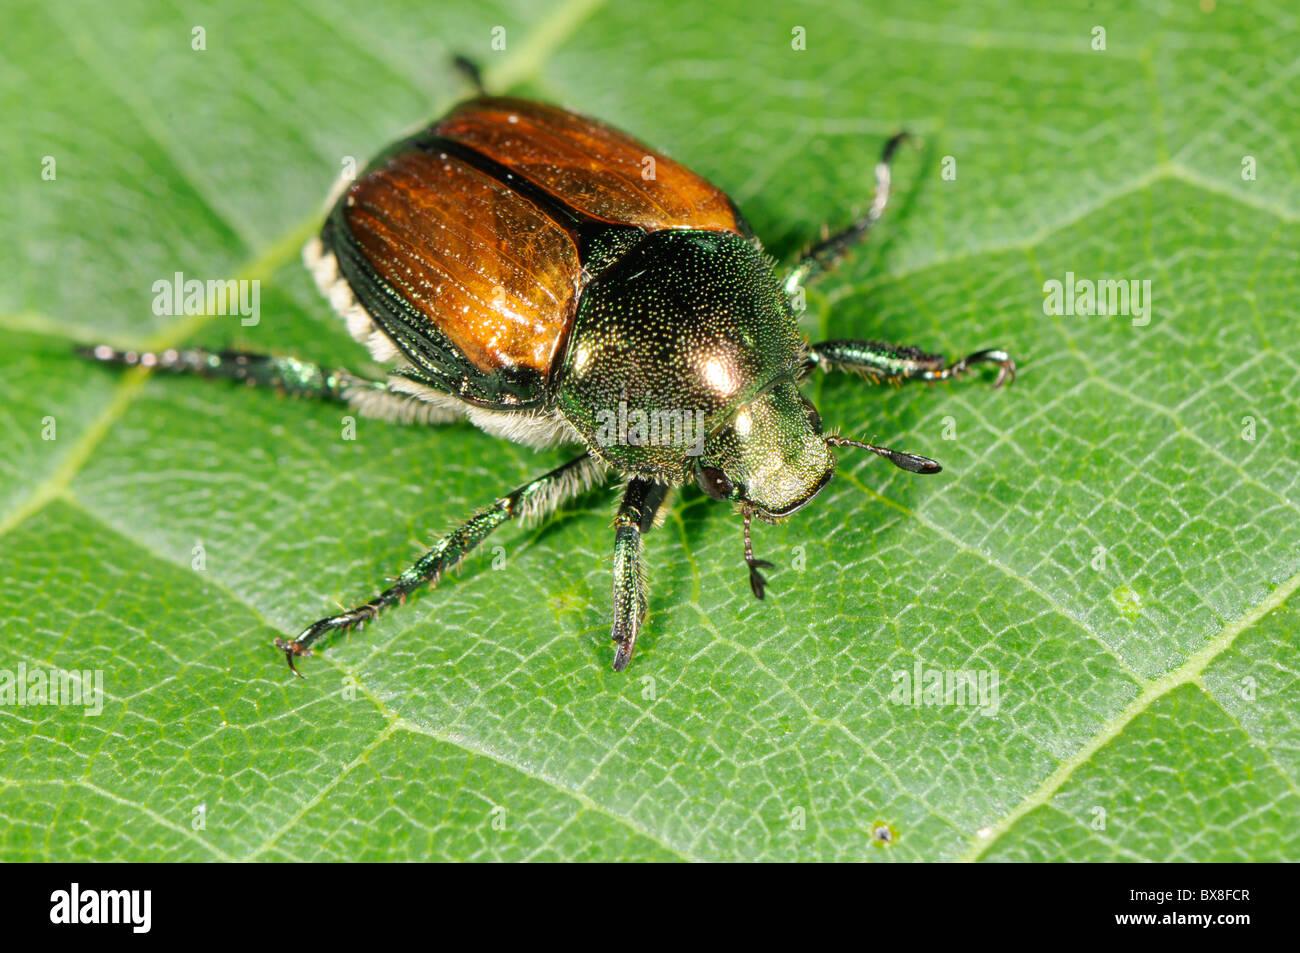 Japanese beetle,  Popillia japonica - Stock Image